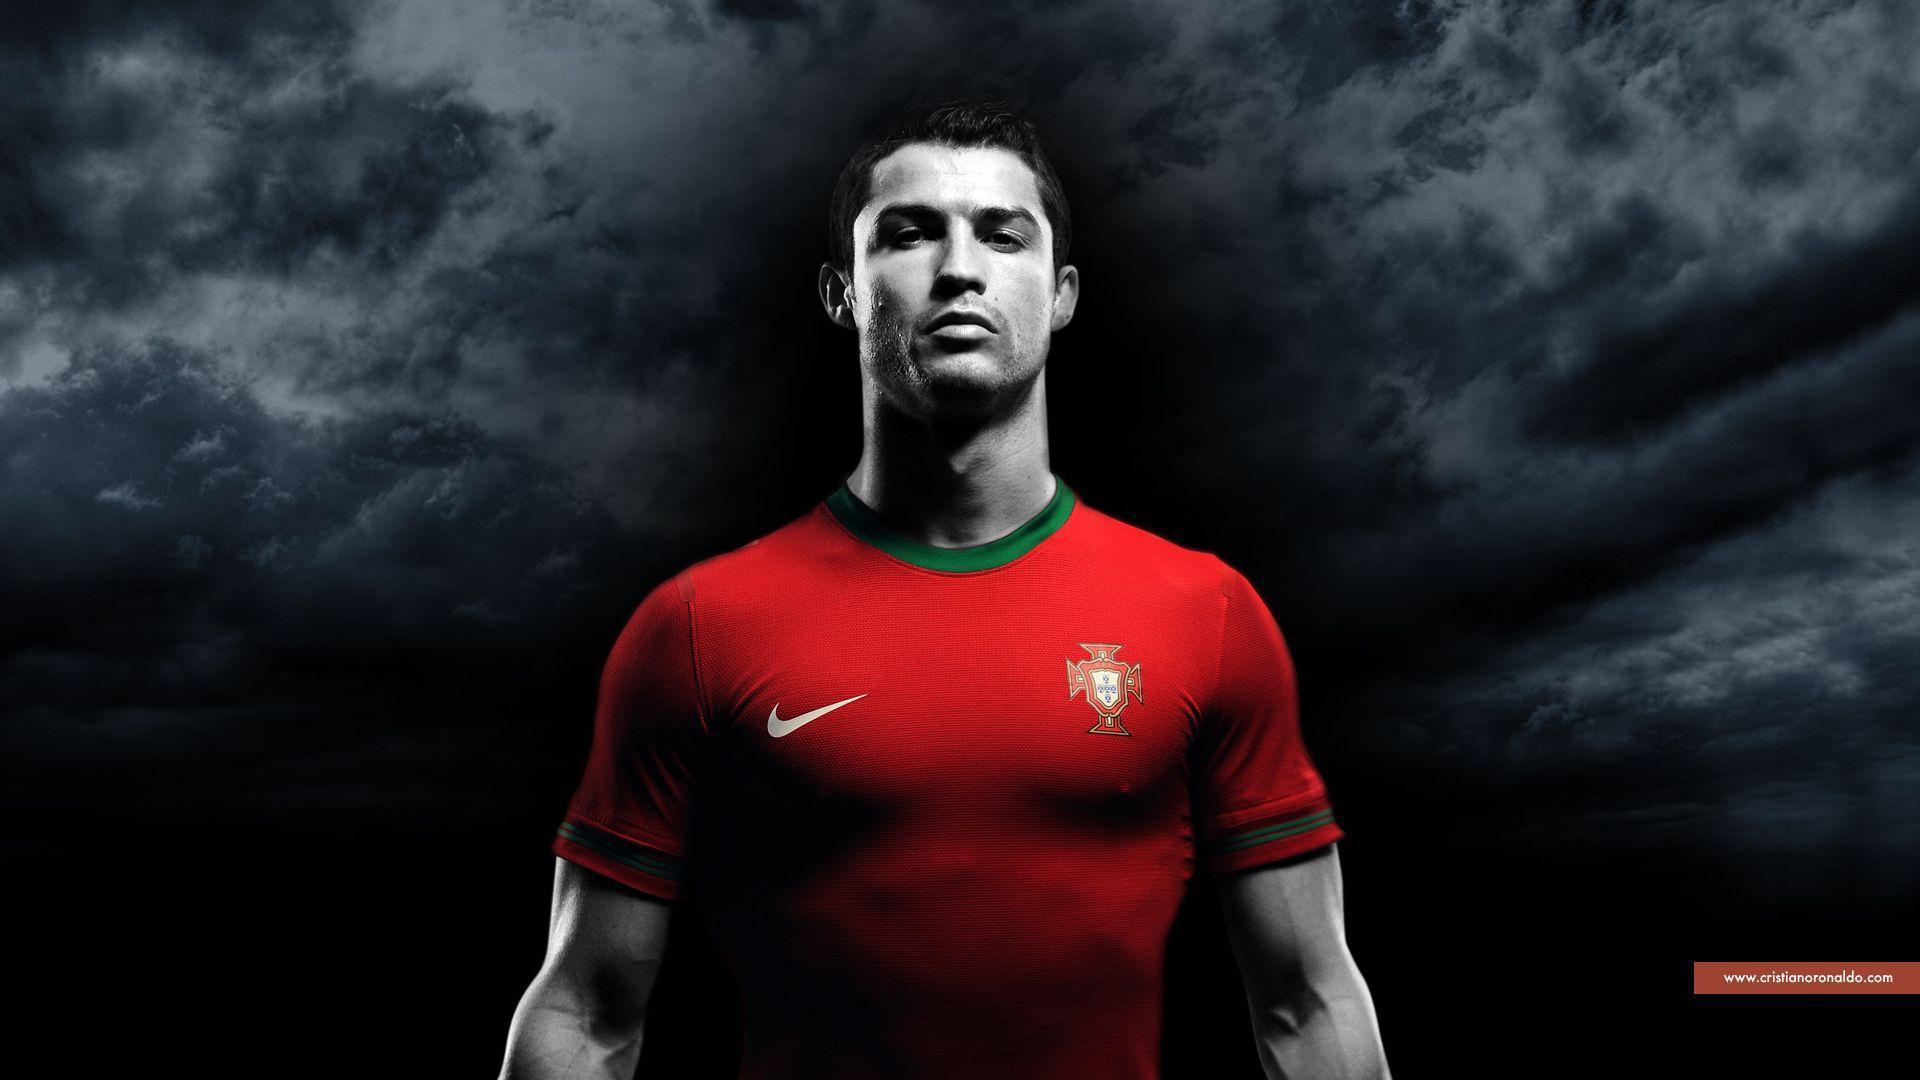 Cristiano Ronaldo 7 Wallpapers 2017 - Wallpaper Cave